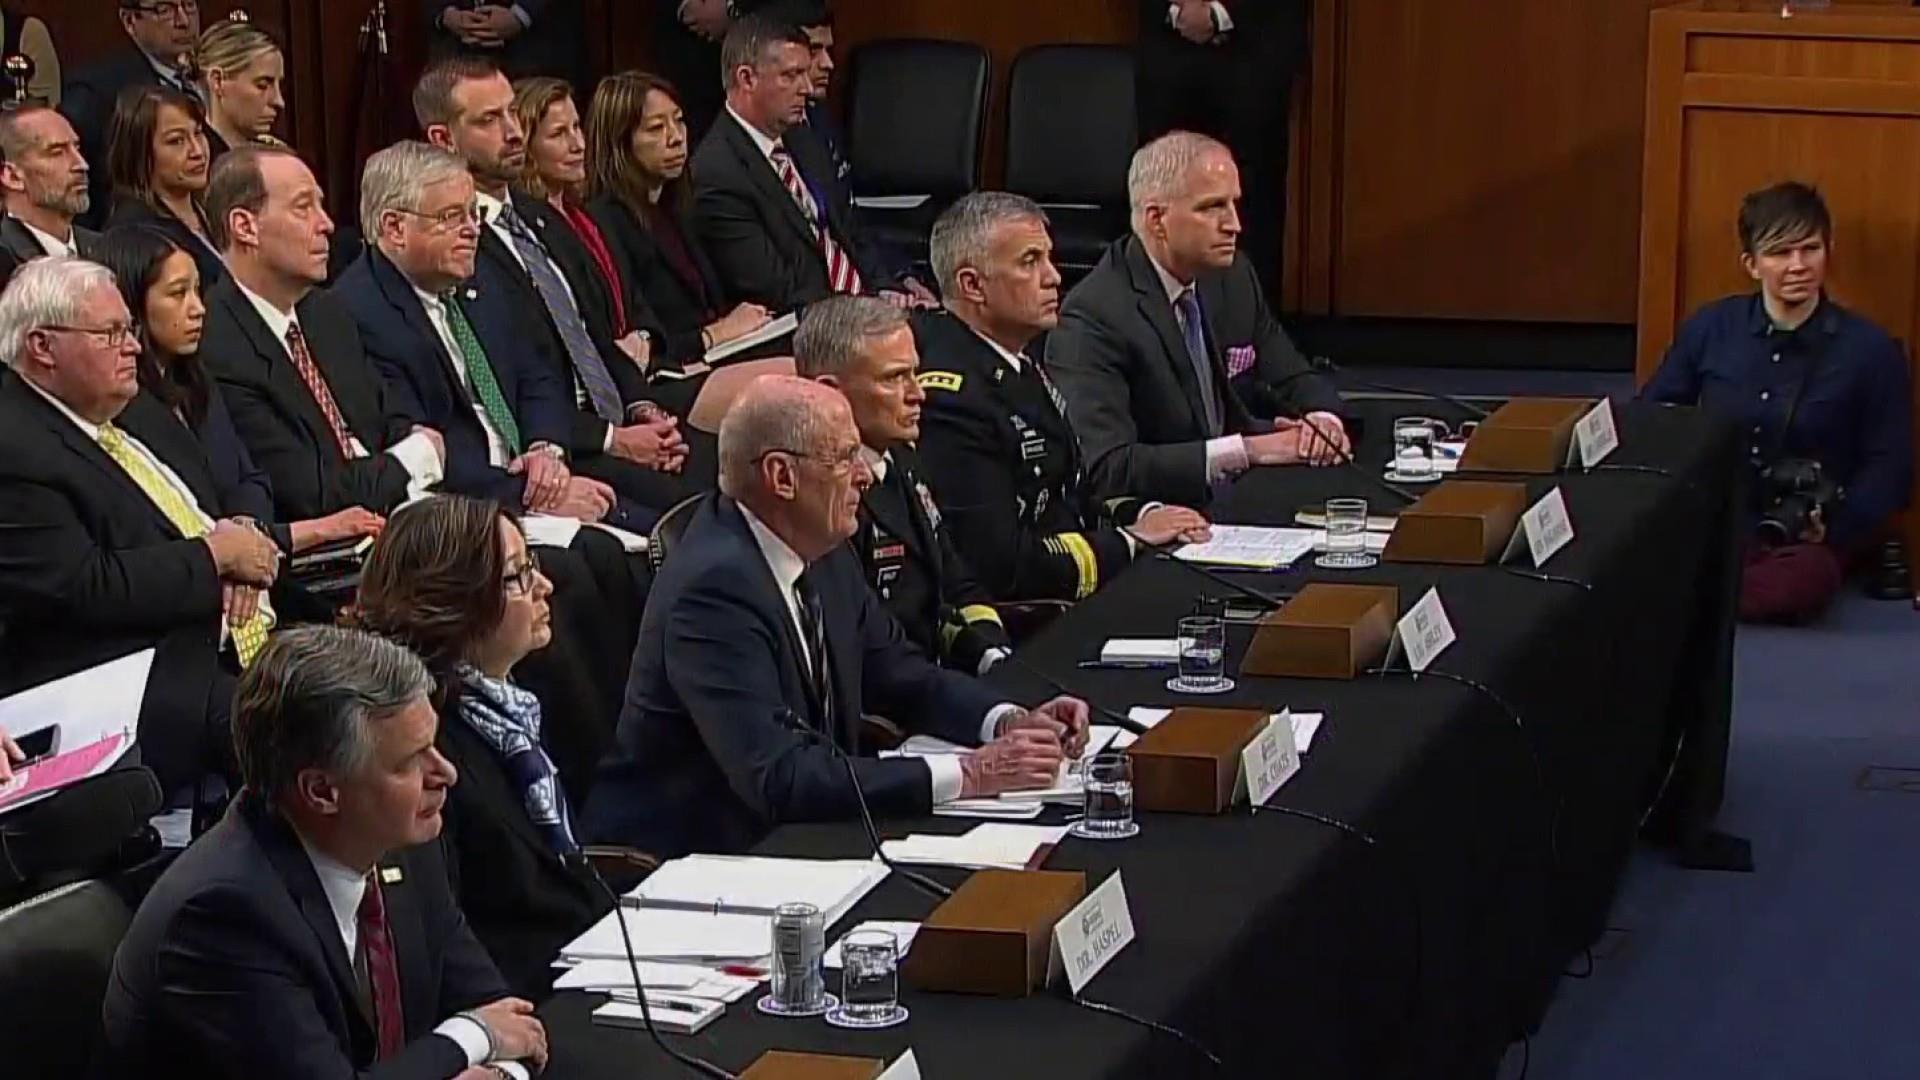 Sen. Schumer calls for Intel. 'Intervention' to educate Trump